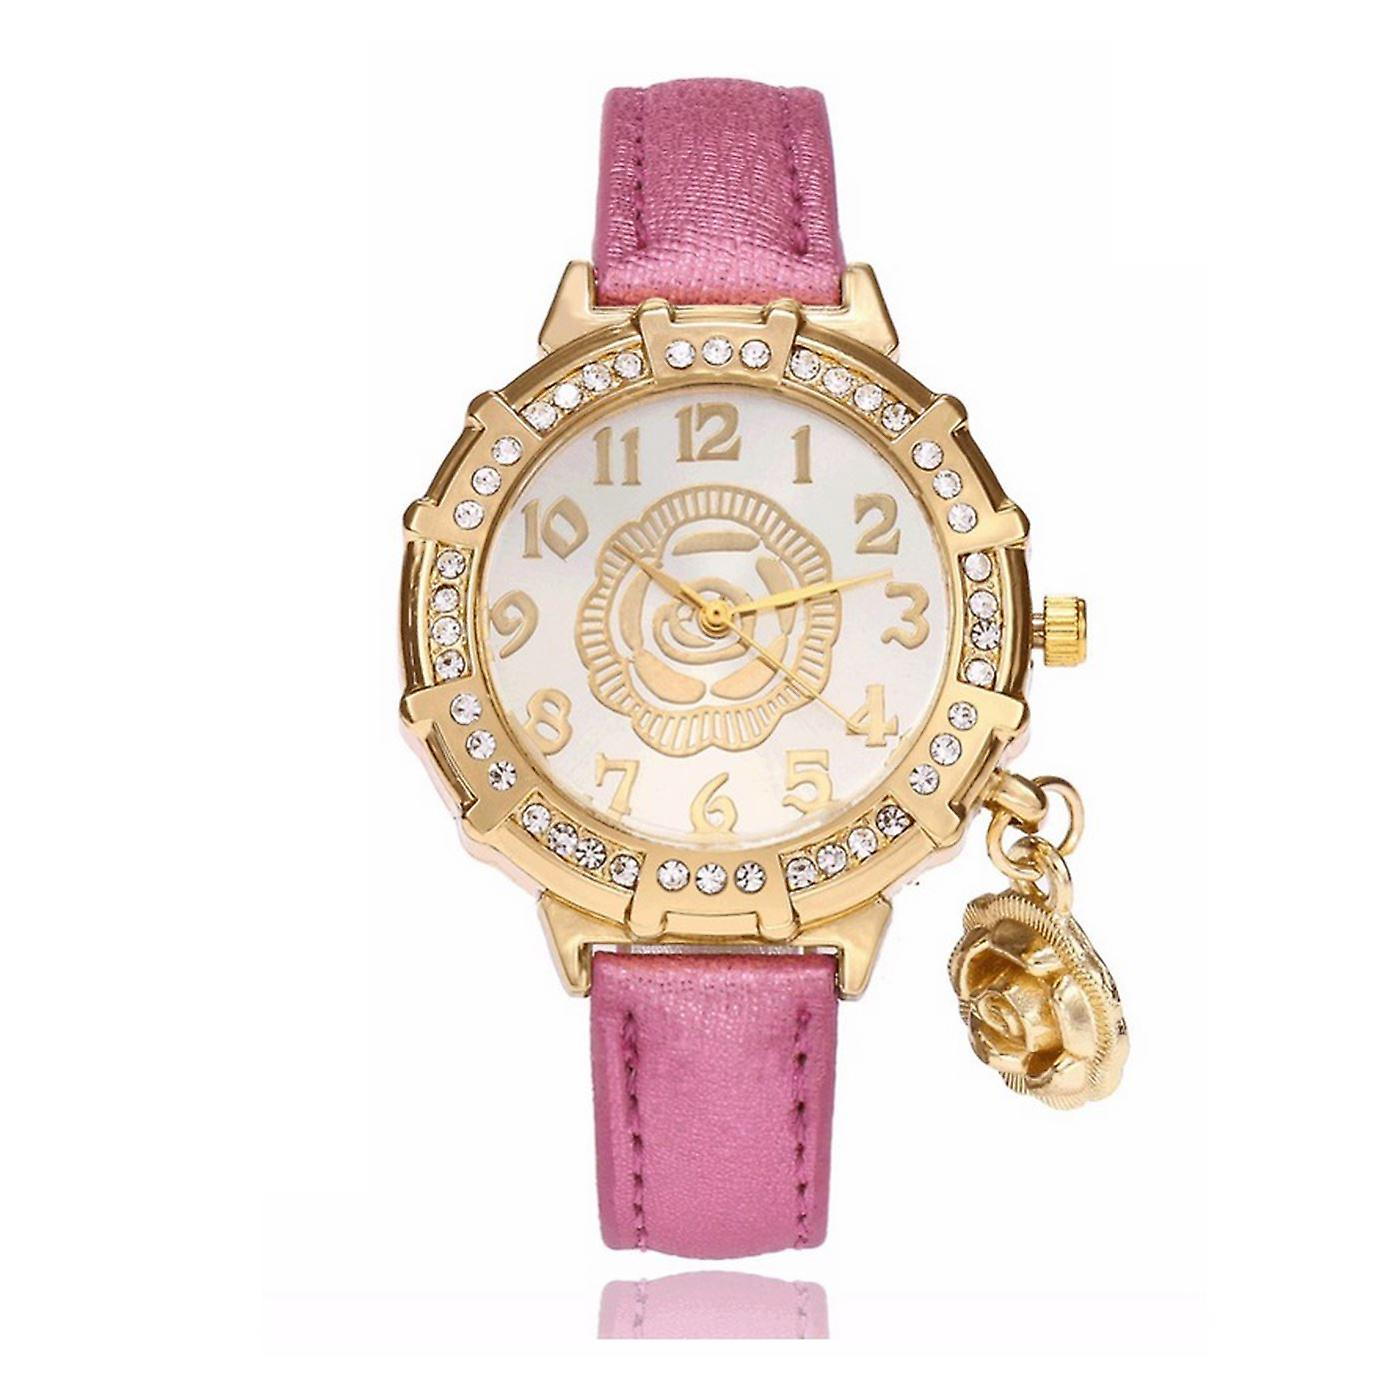 Classy Yellow Gold Flower Watch Luxury Stones Elegant Time PINK